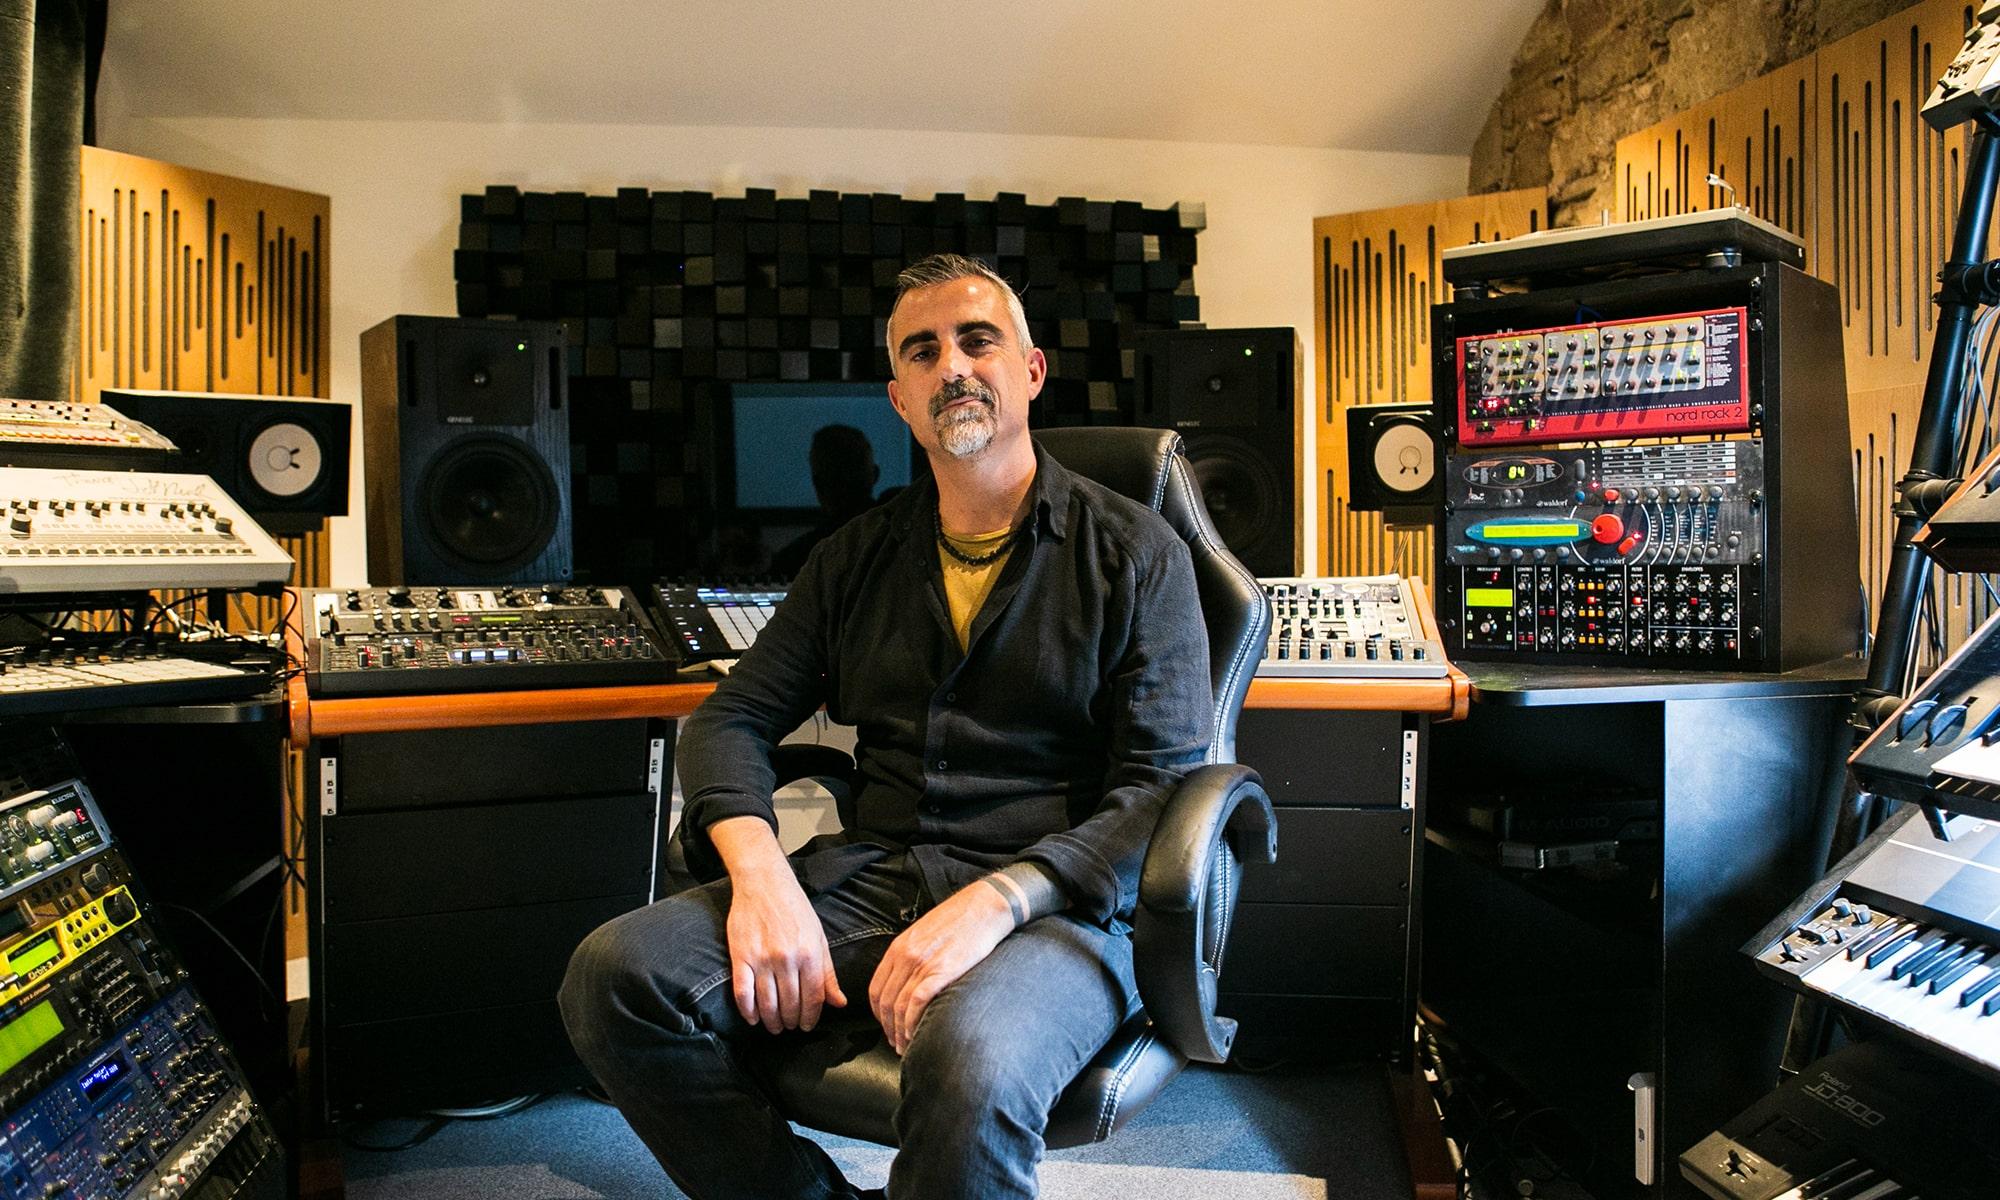 Xceed-Barcelona-Interview-Gaetano Parisio